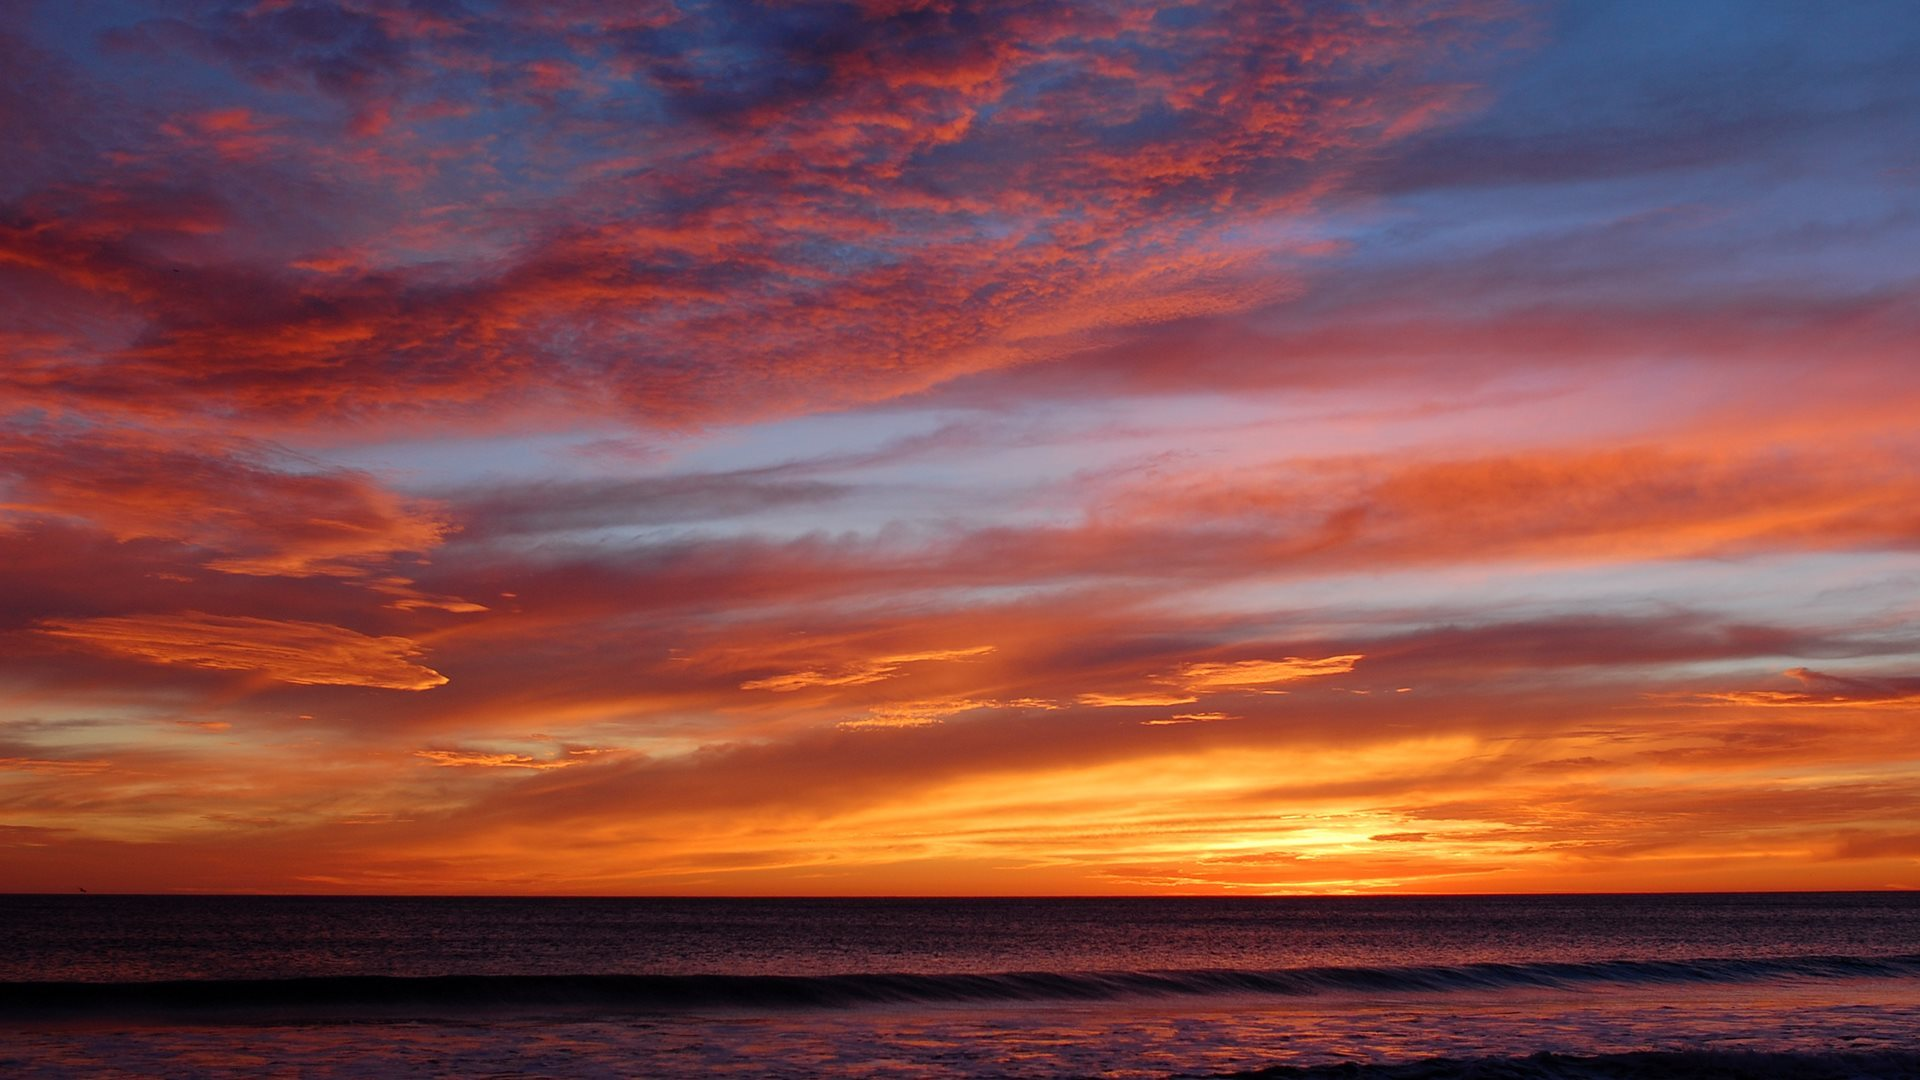 another sunset wallpaper [1920x1080]